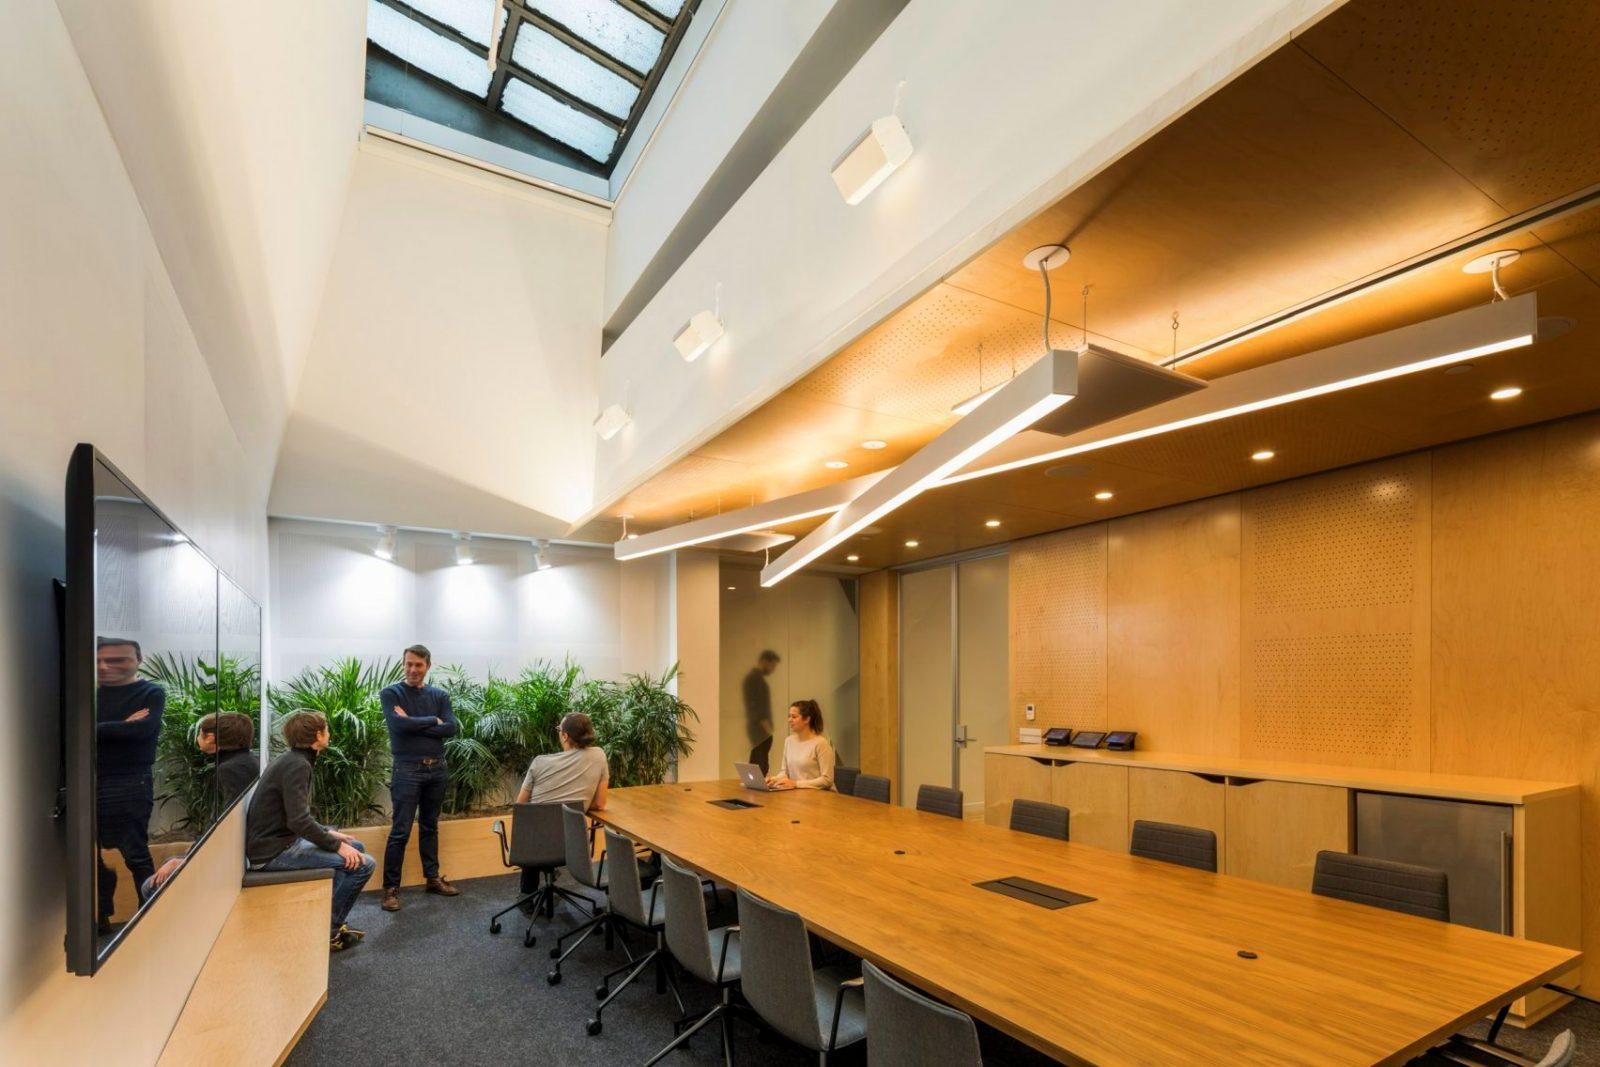 15 - Офисные Столы На Заказ